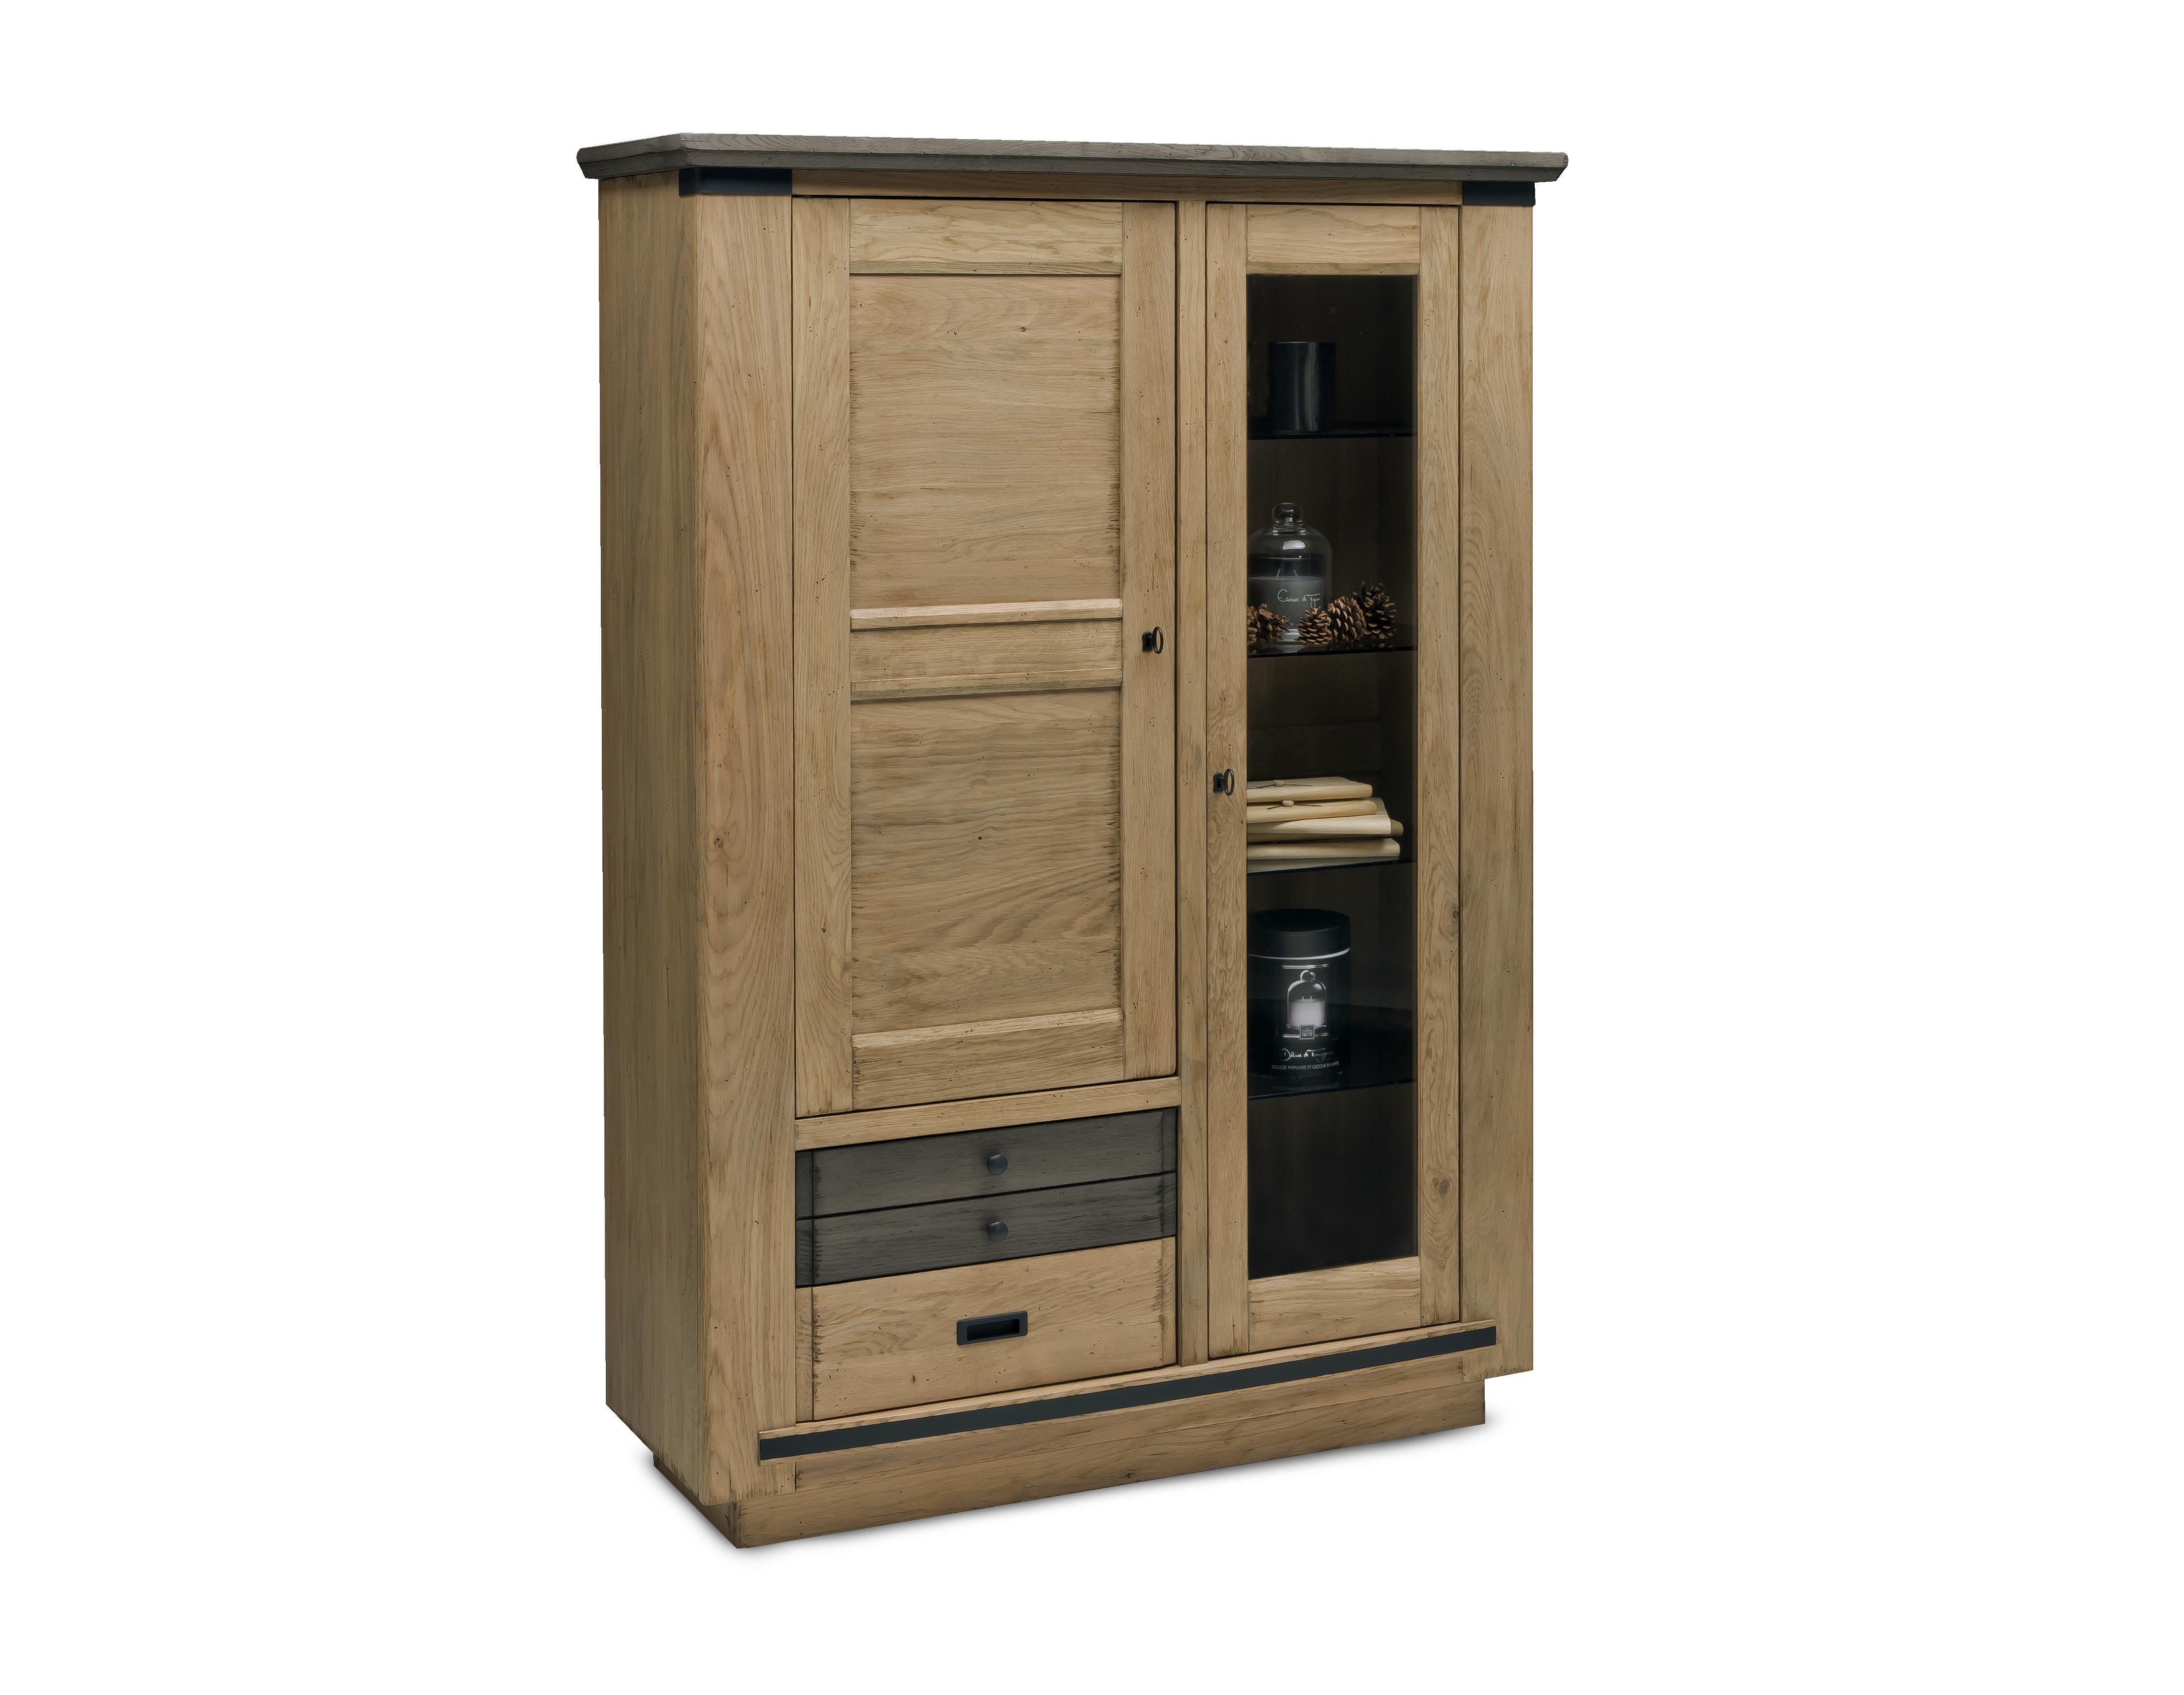 Meuble salle a manger magellan ateliers de langres meubles for Meuble salle a manger vitrine